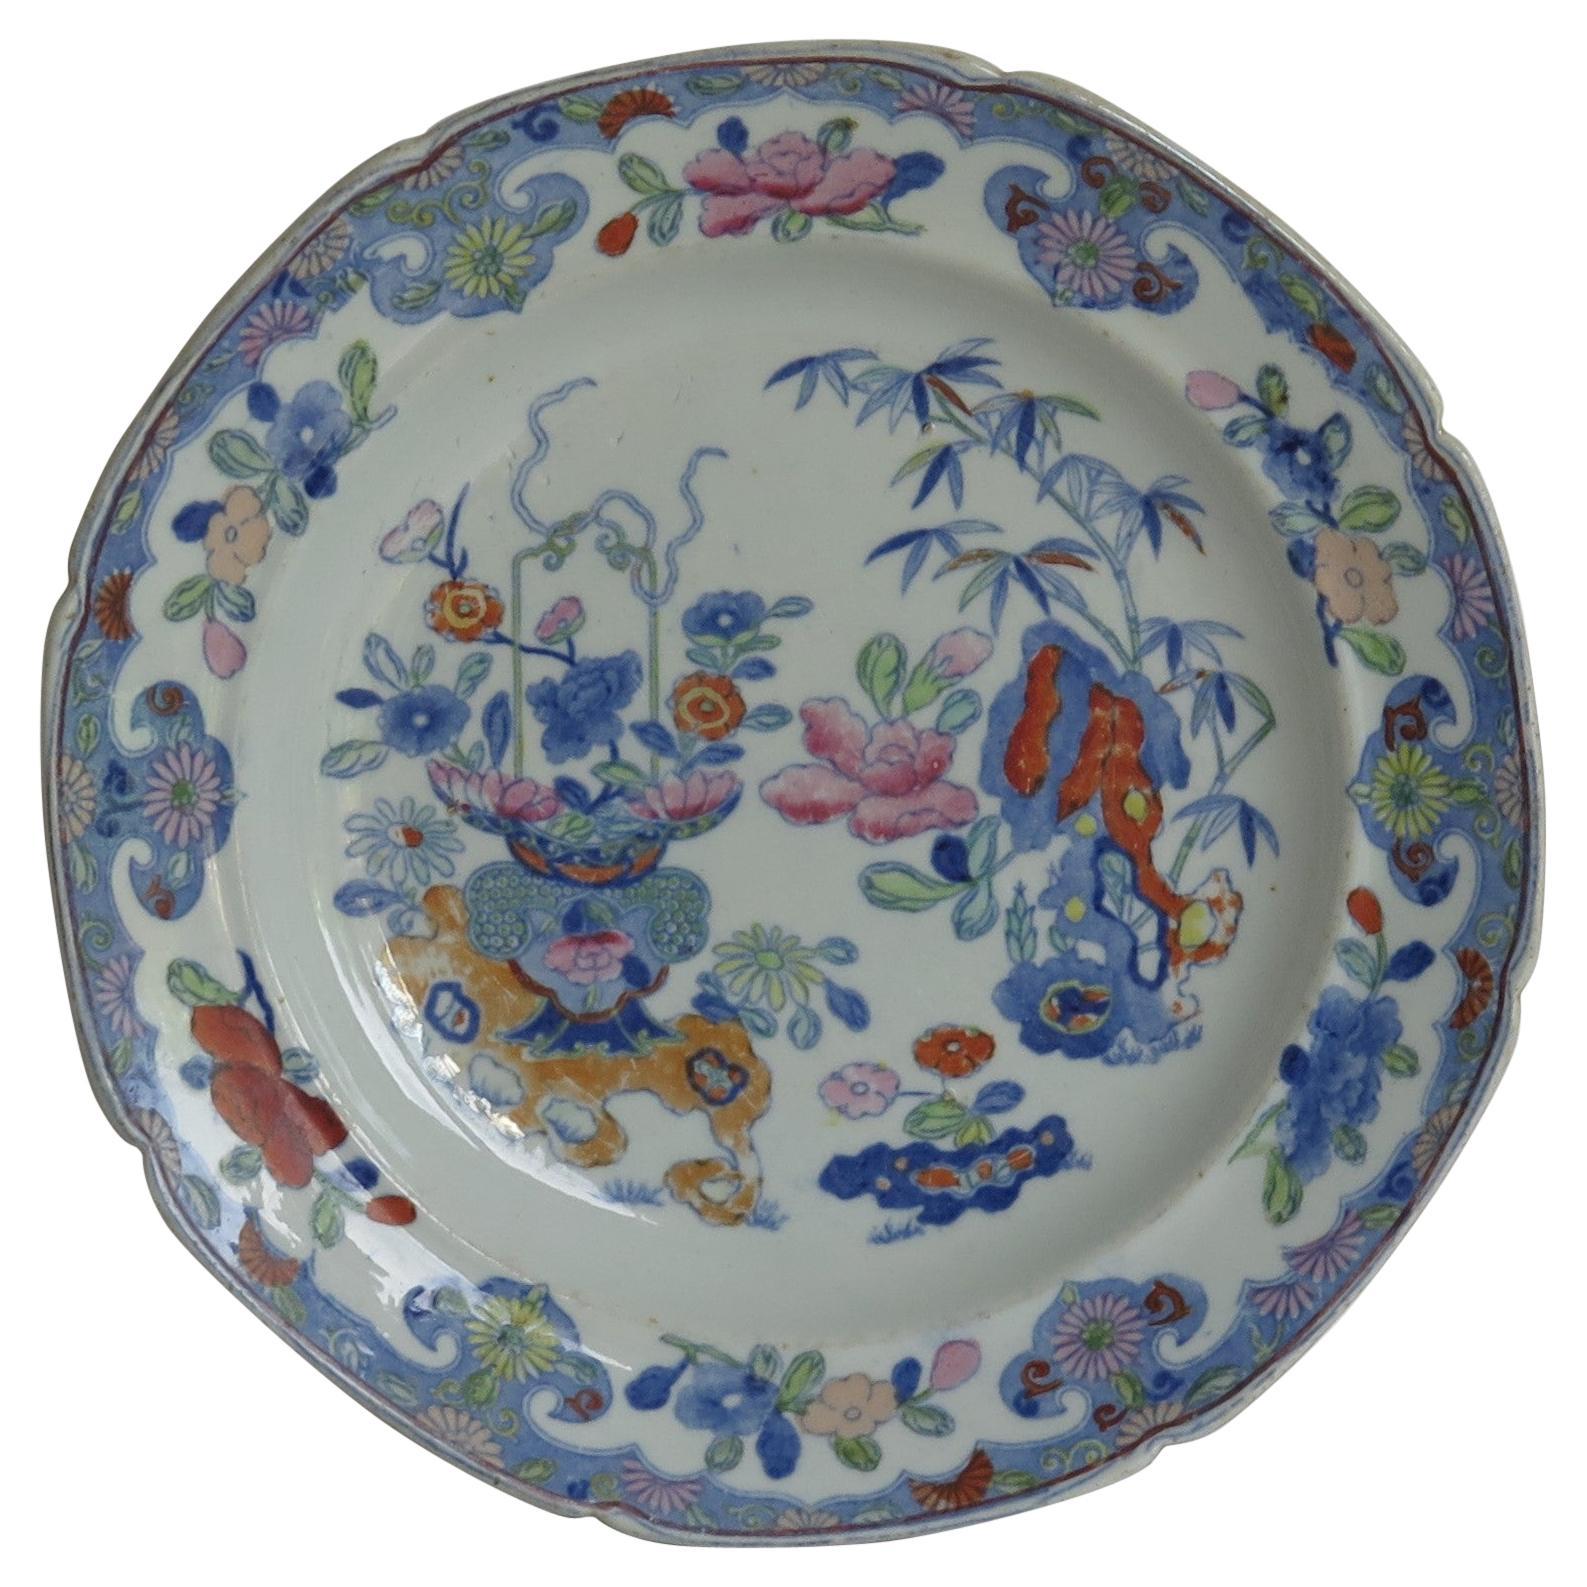 Georgian Mason's Ironstone Dish or Plate in Bamboo & Basket Pattern, circa 1817